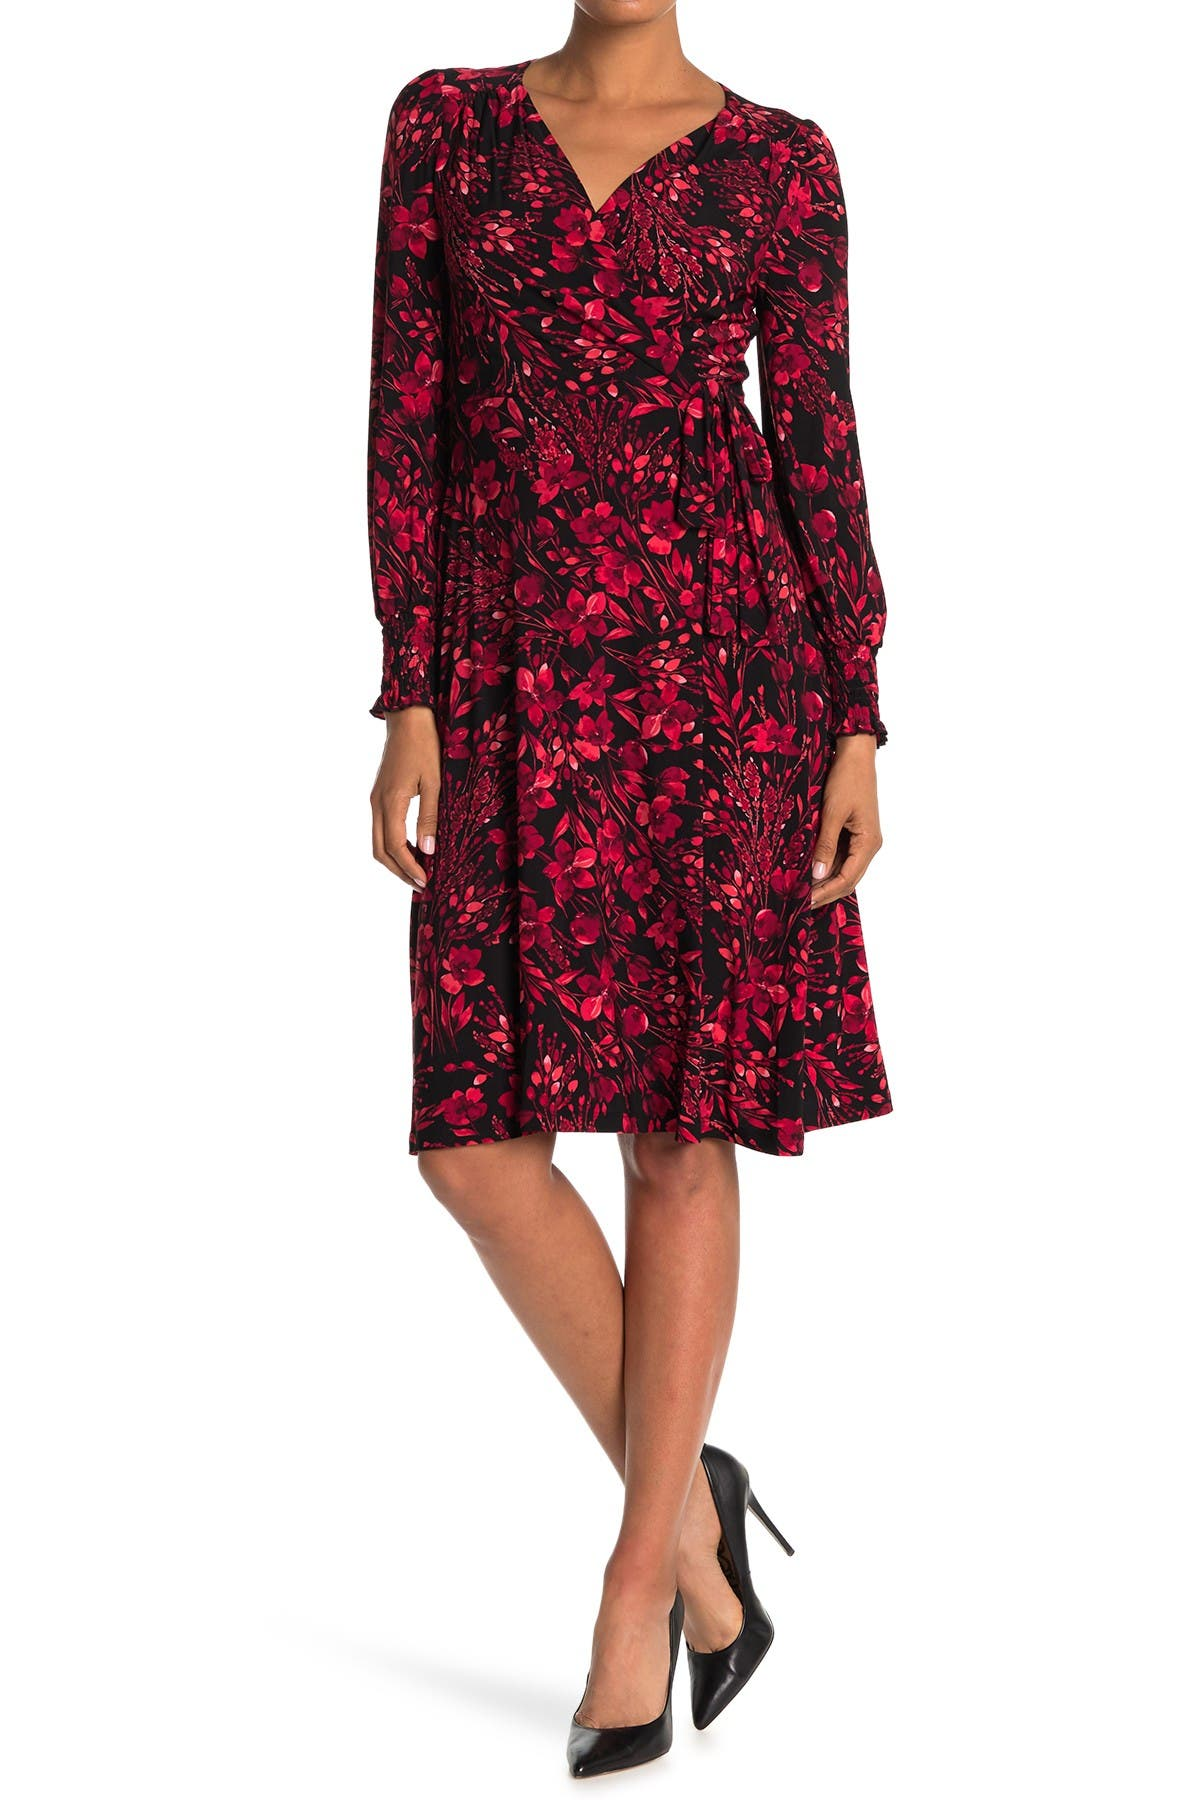 Image of Tommy Hilfiger Long Sleeve Jersey Floral Surplice Neck Dress